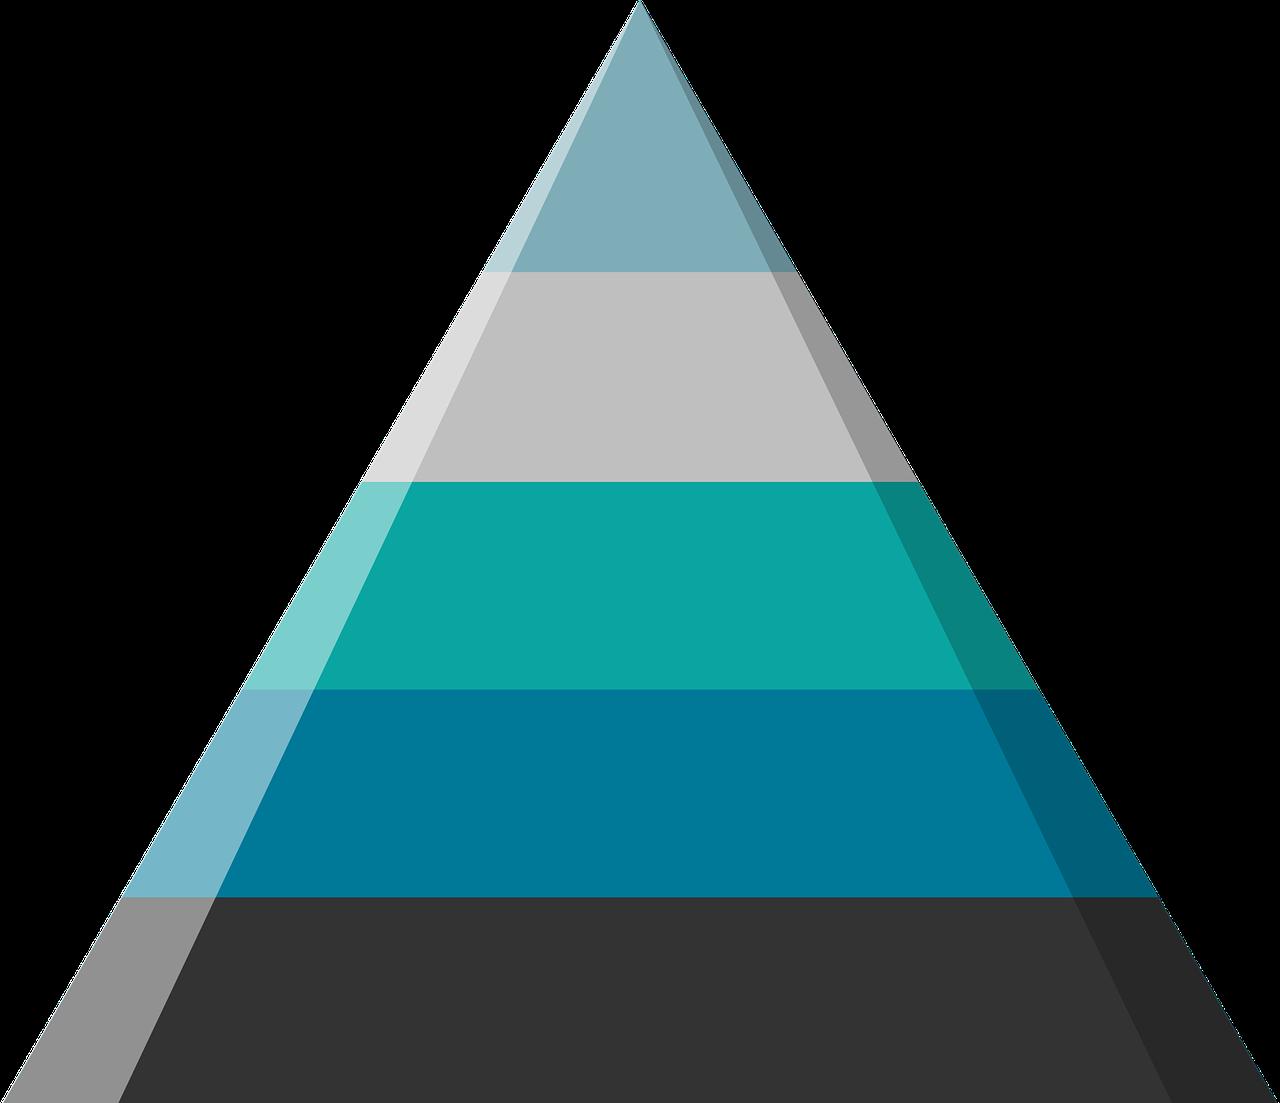 triangle-3577388_1280